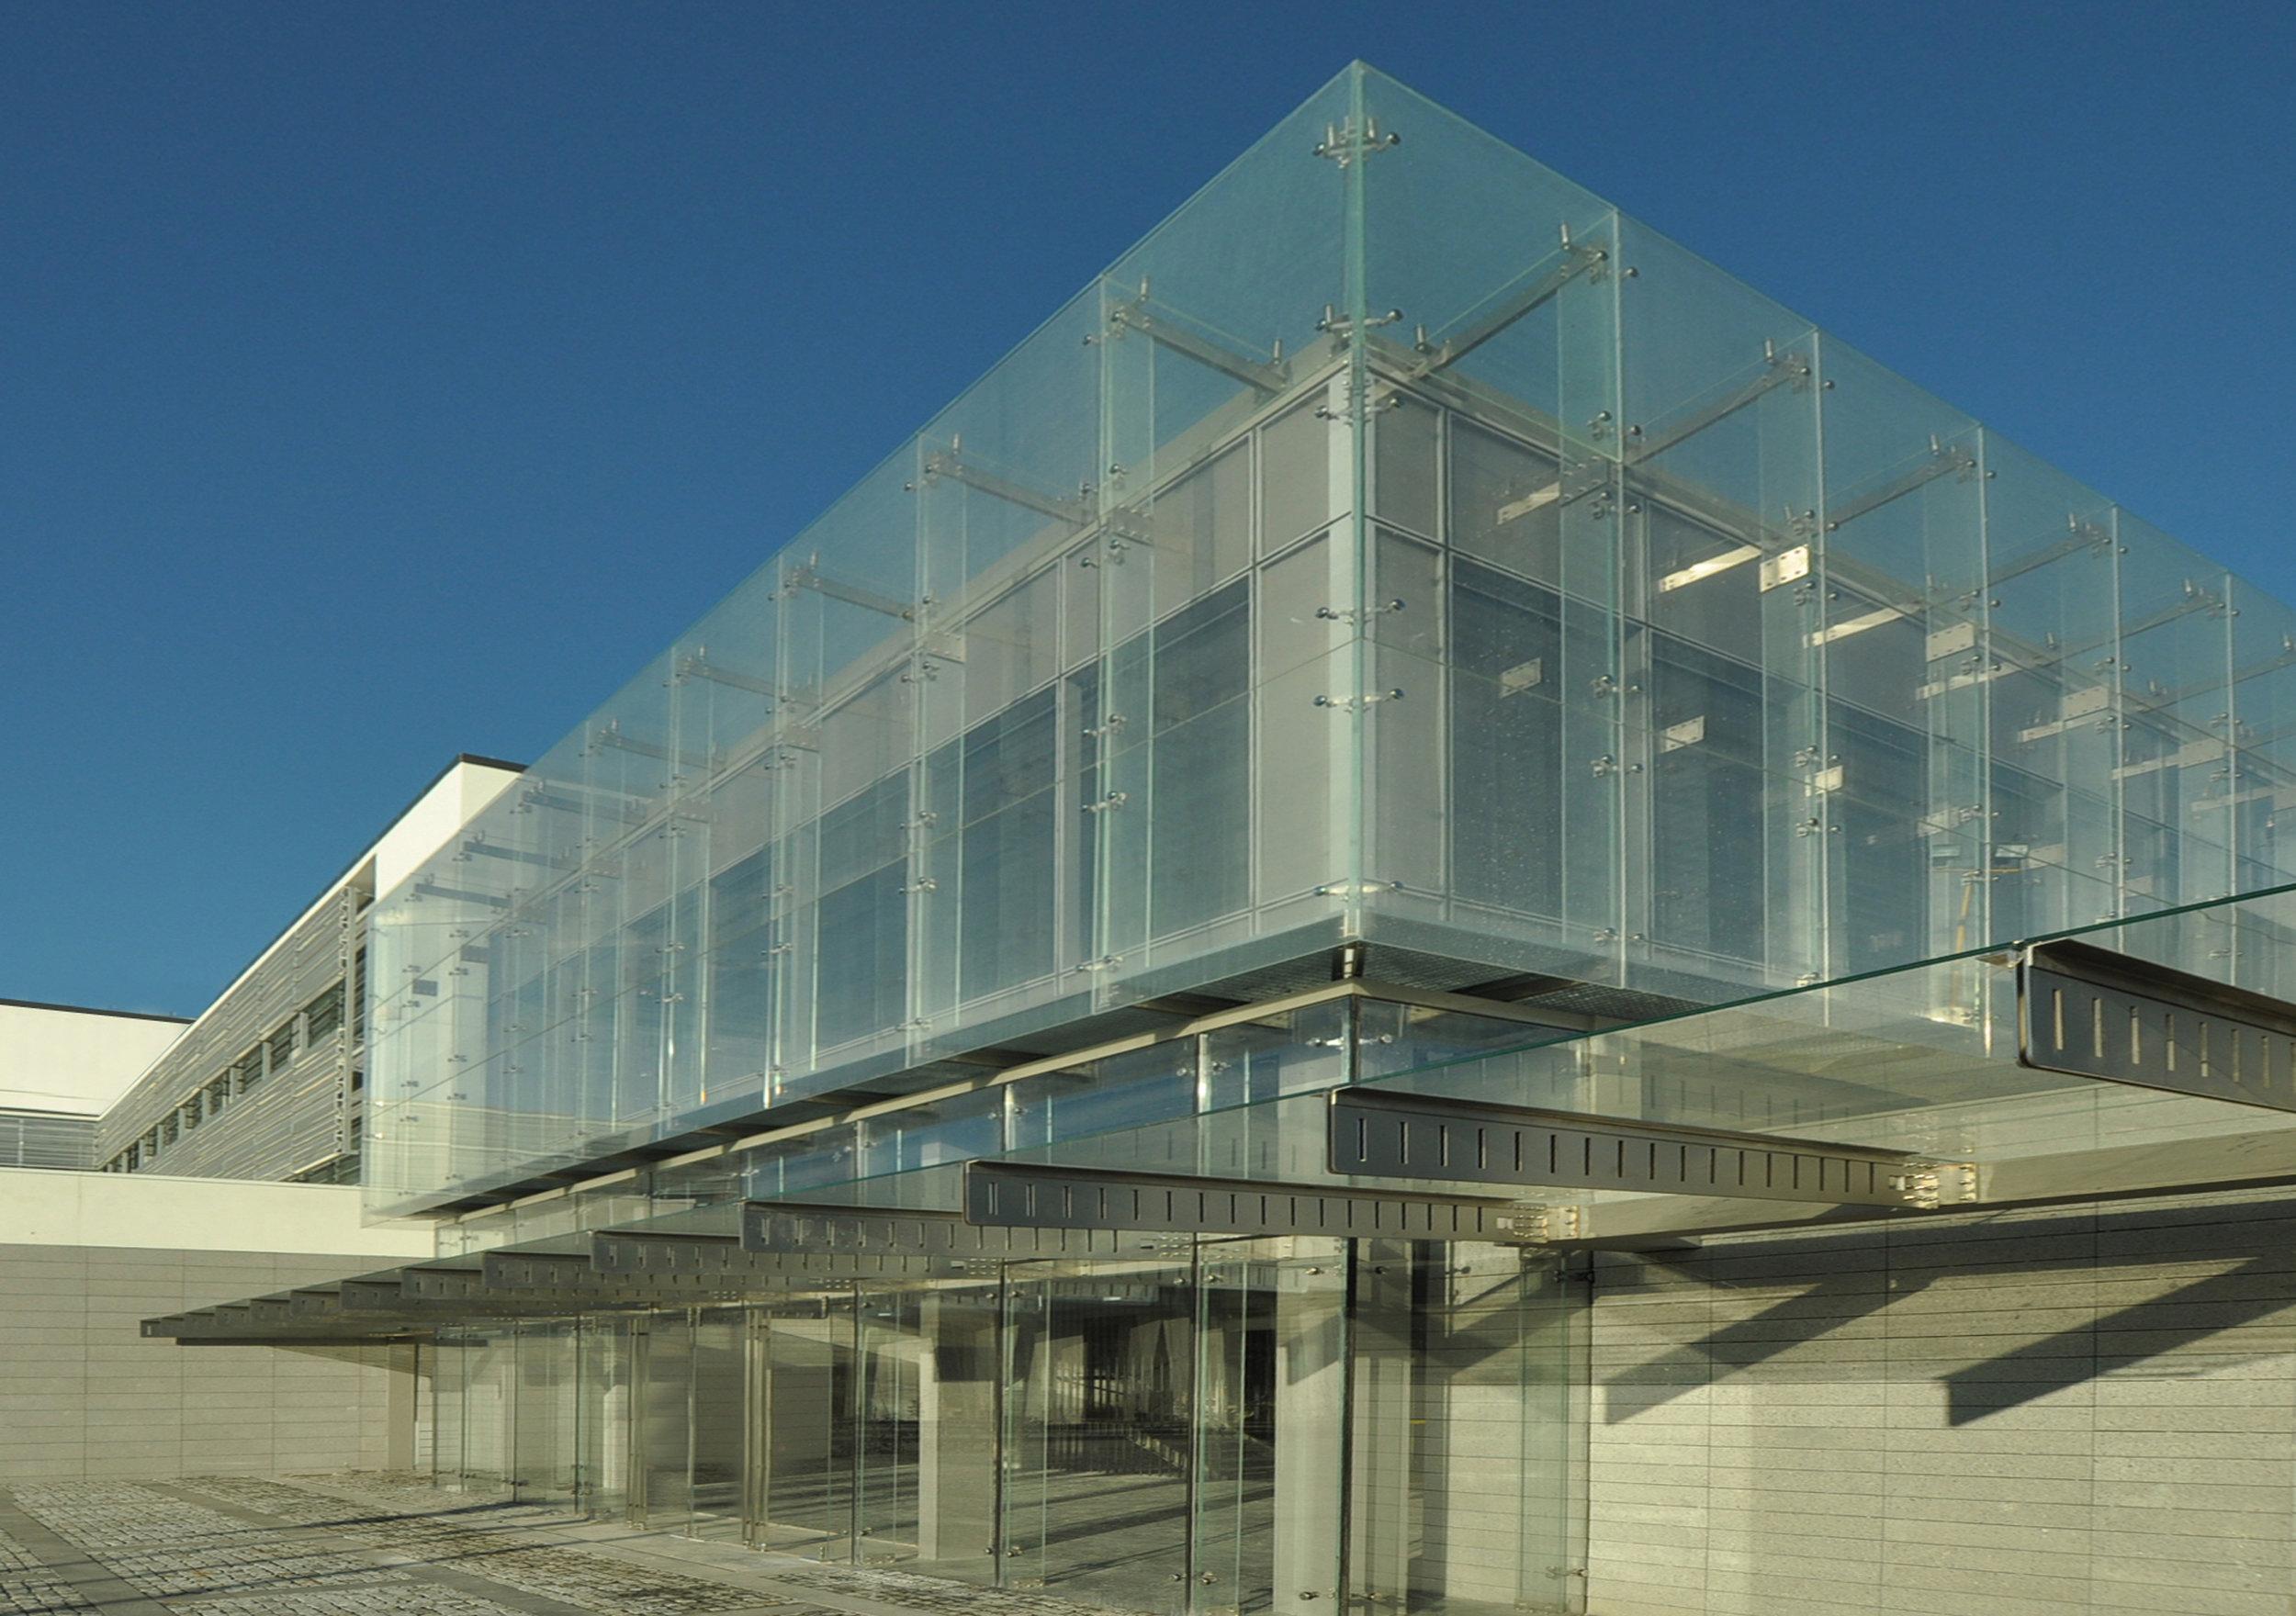 OZU pavilion_exterior 1b.jpg